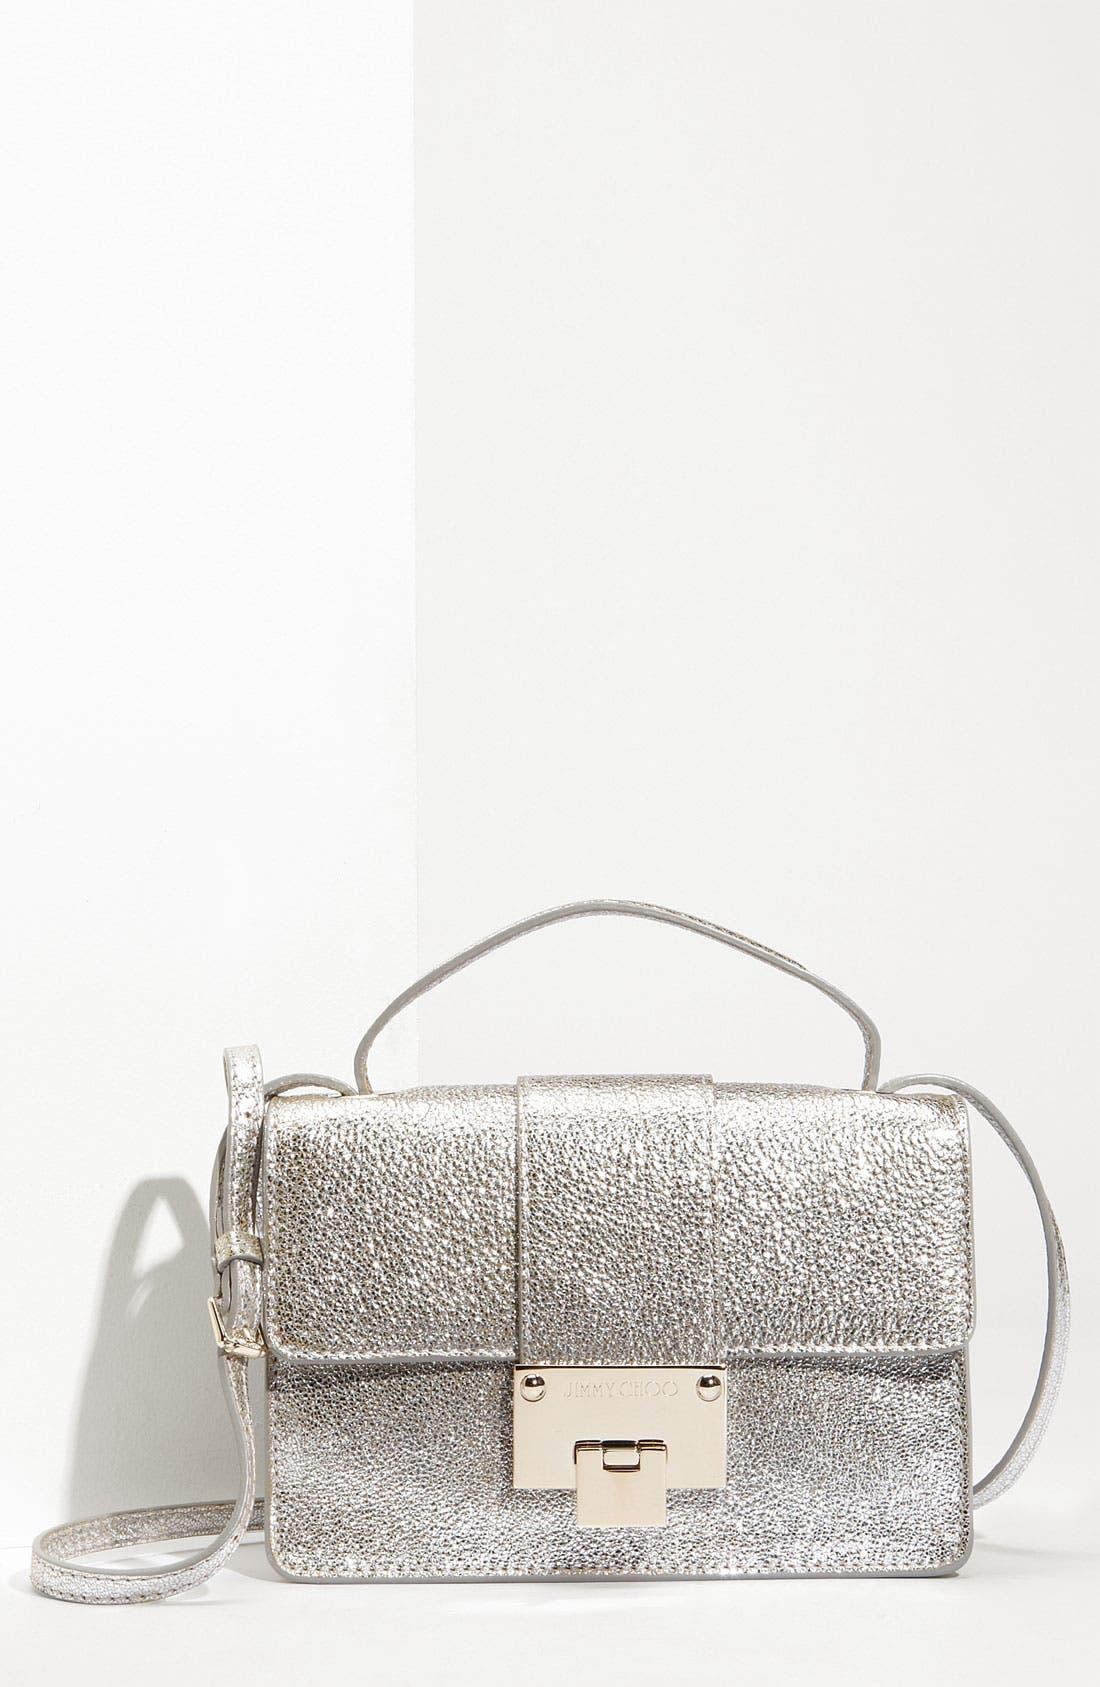 Alternate Image 1 Selected - Jimmy Choo 'Rebel Mini' Glitter Leather Crossbody Bag